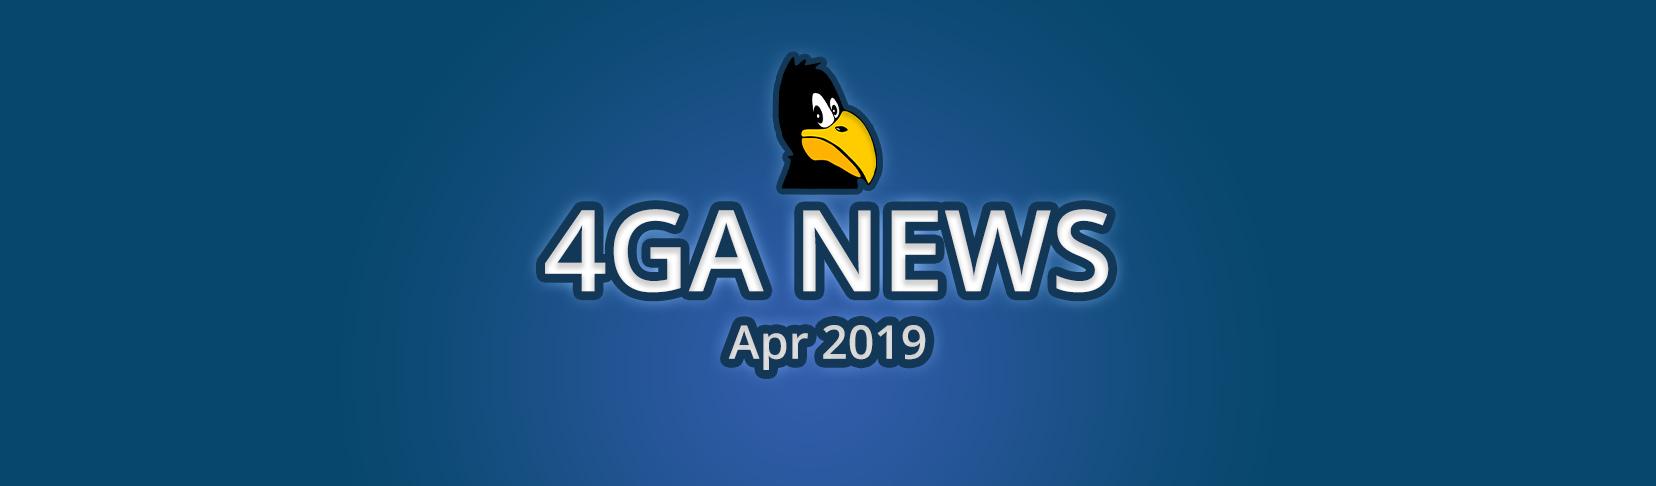 4ga News Apr19